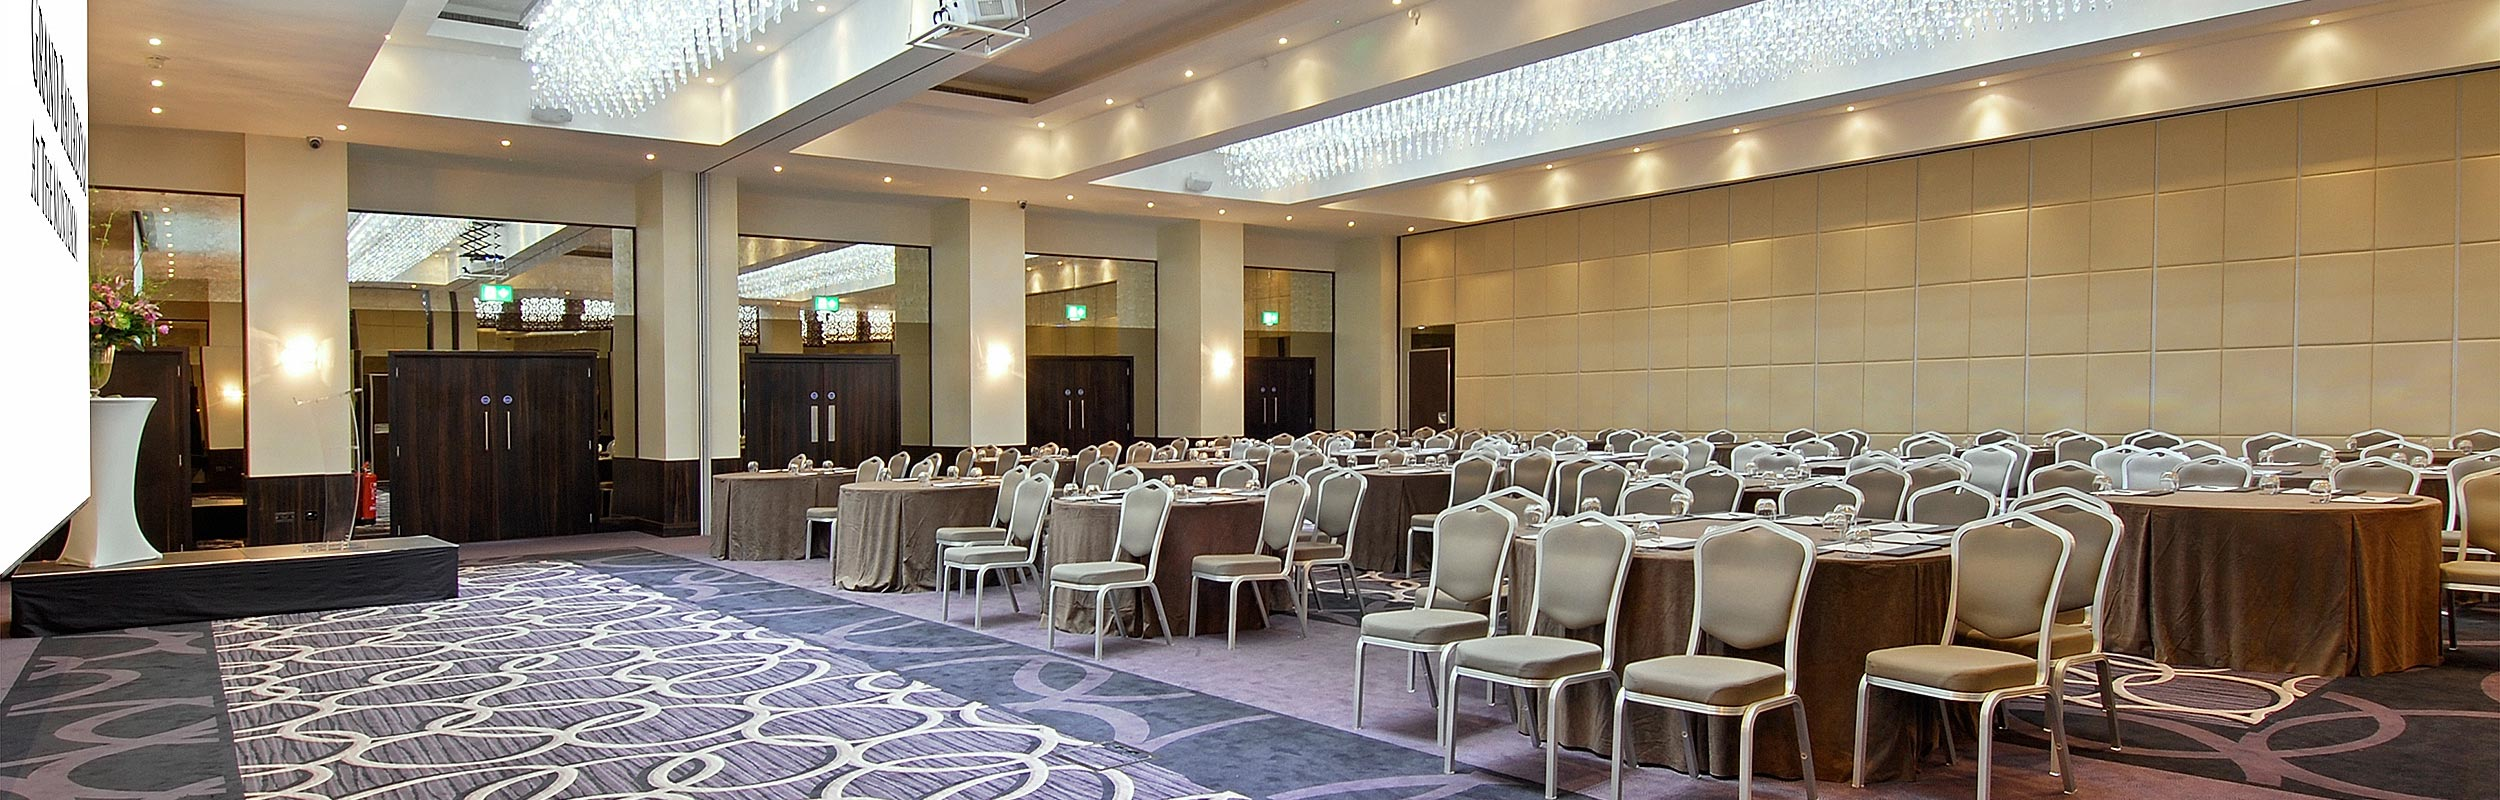 Meeting photo gallery grand ballroom at the montcalm london for 27 devonshire terrace paddington london w2 3dp england